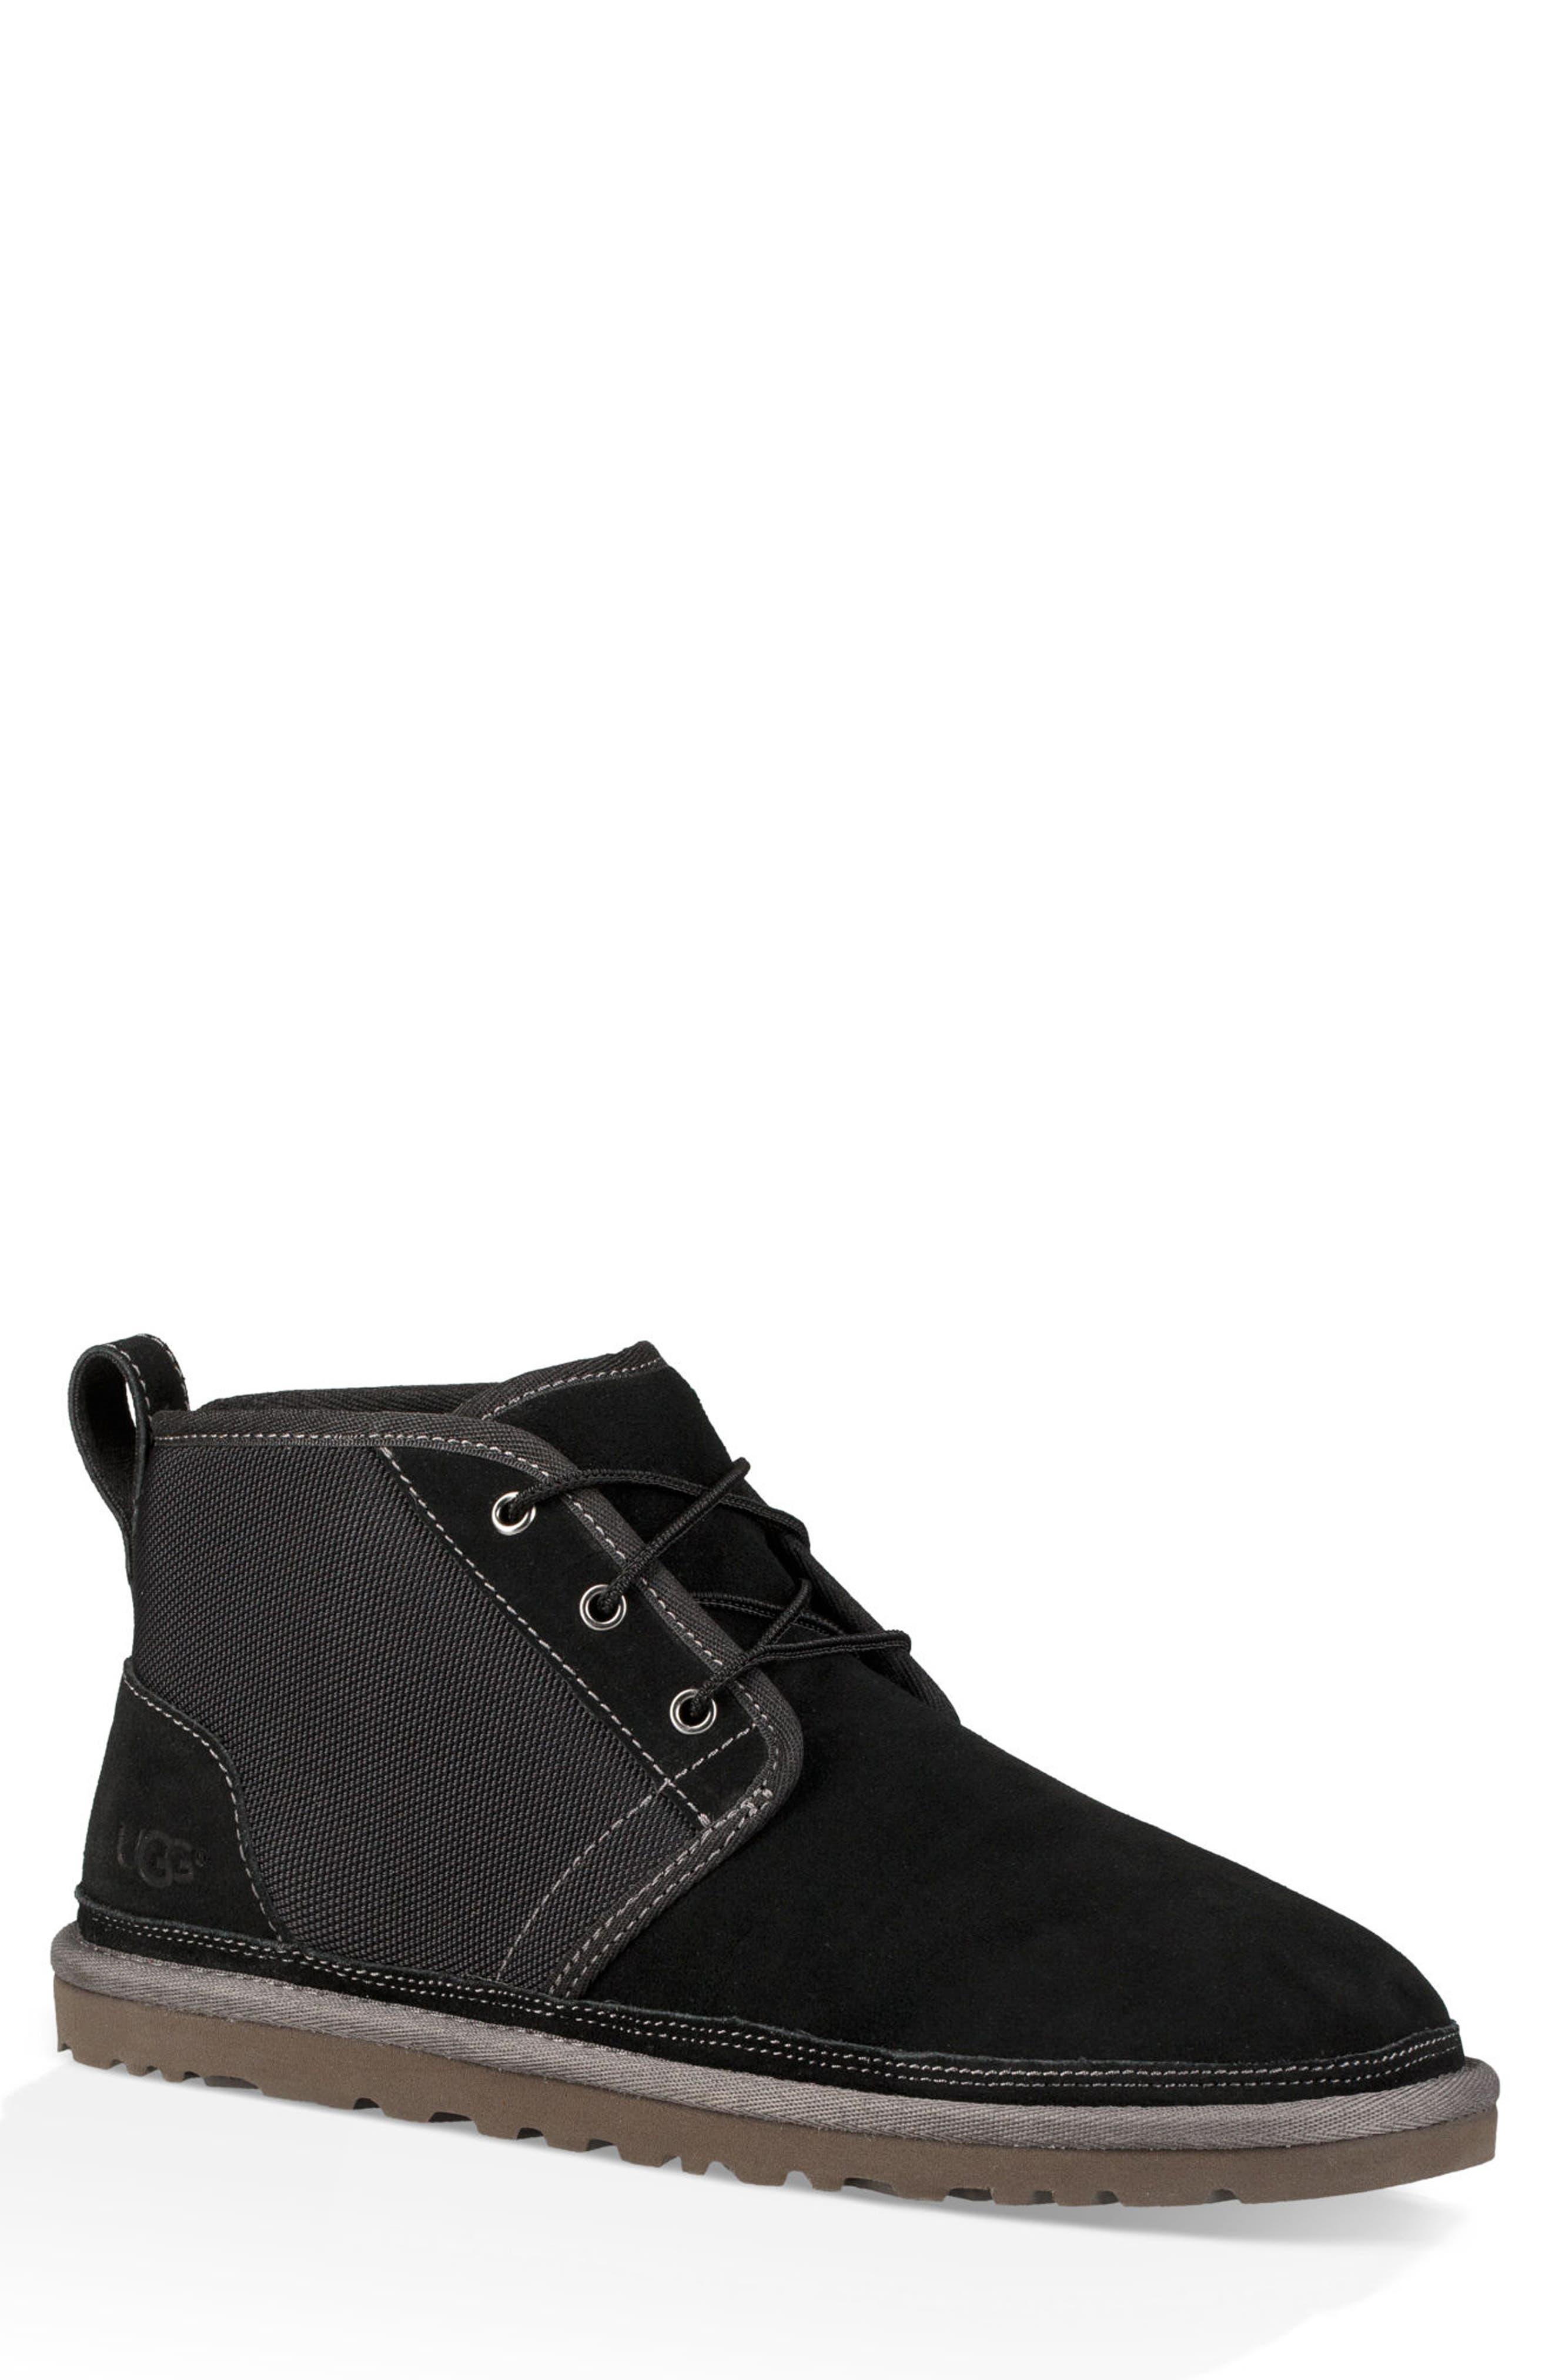 Neumel Unlined Chukka Boot,                         Main,                         color, 001